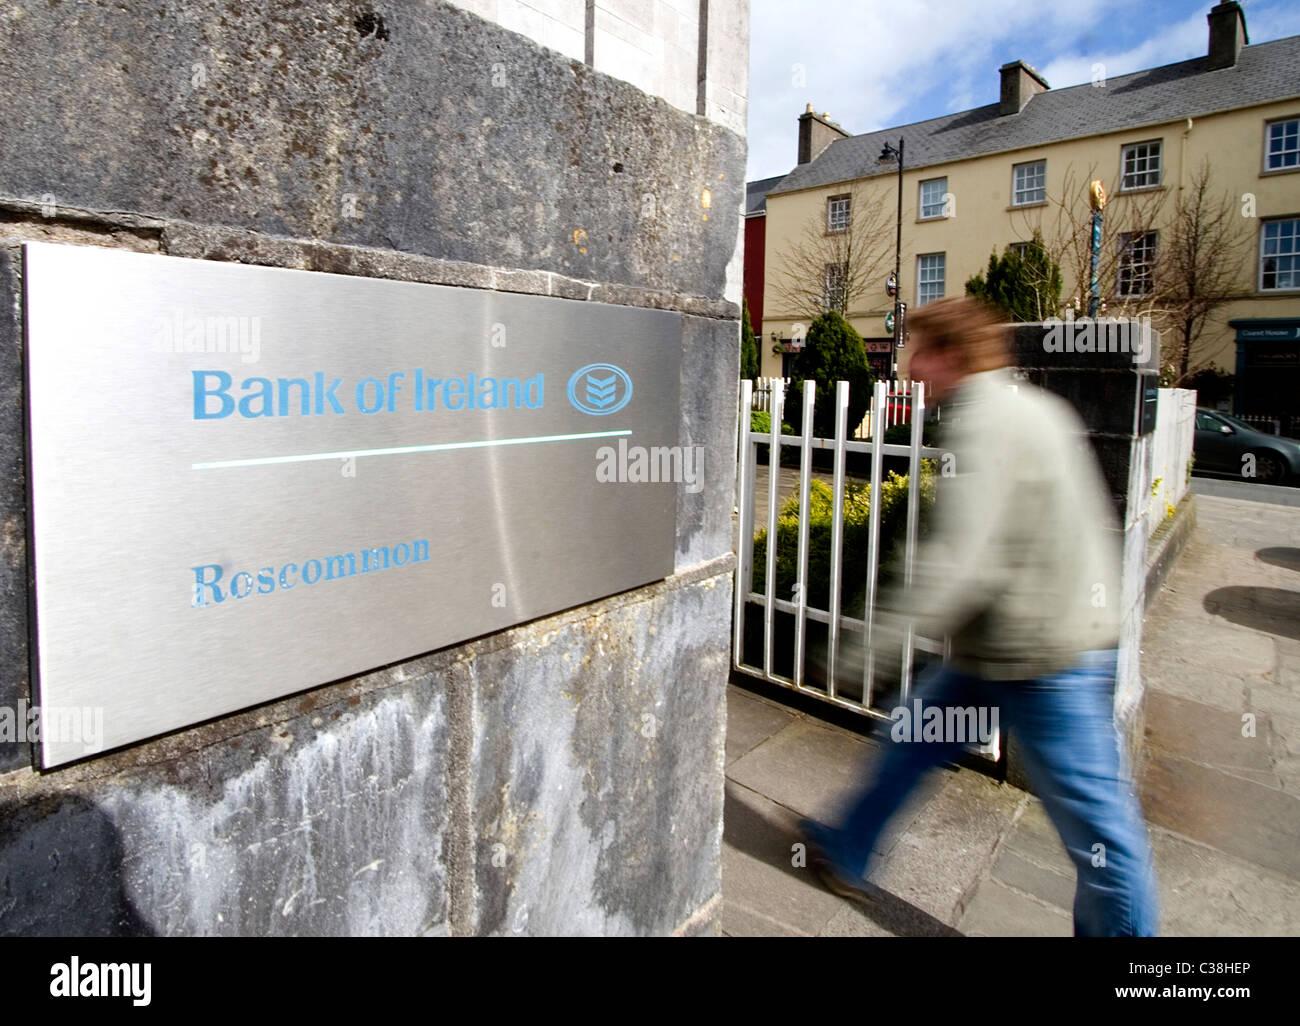 A Bank of Ireland Branch, Roscommon, West of Ireland. - Stock Image